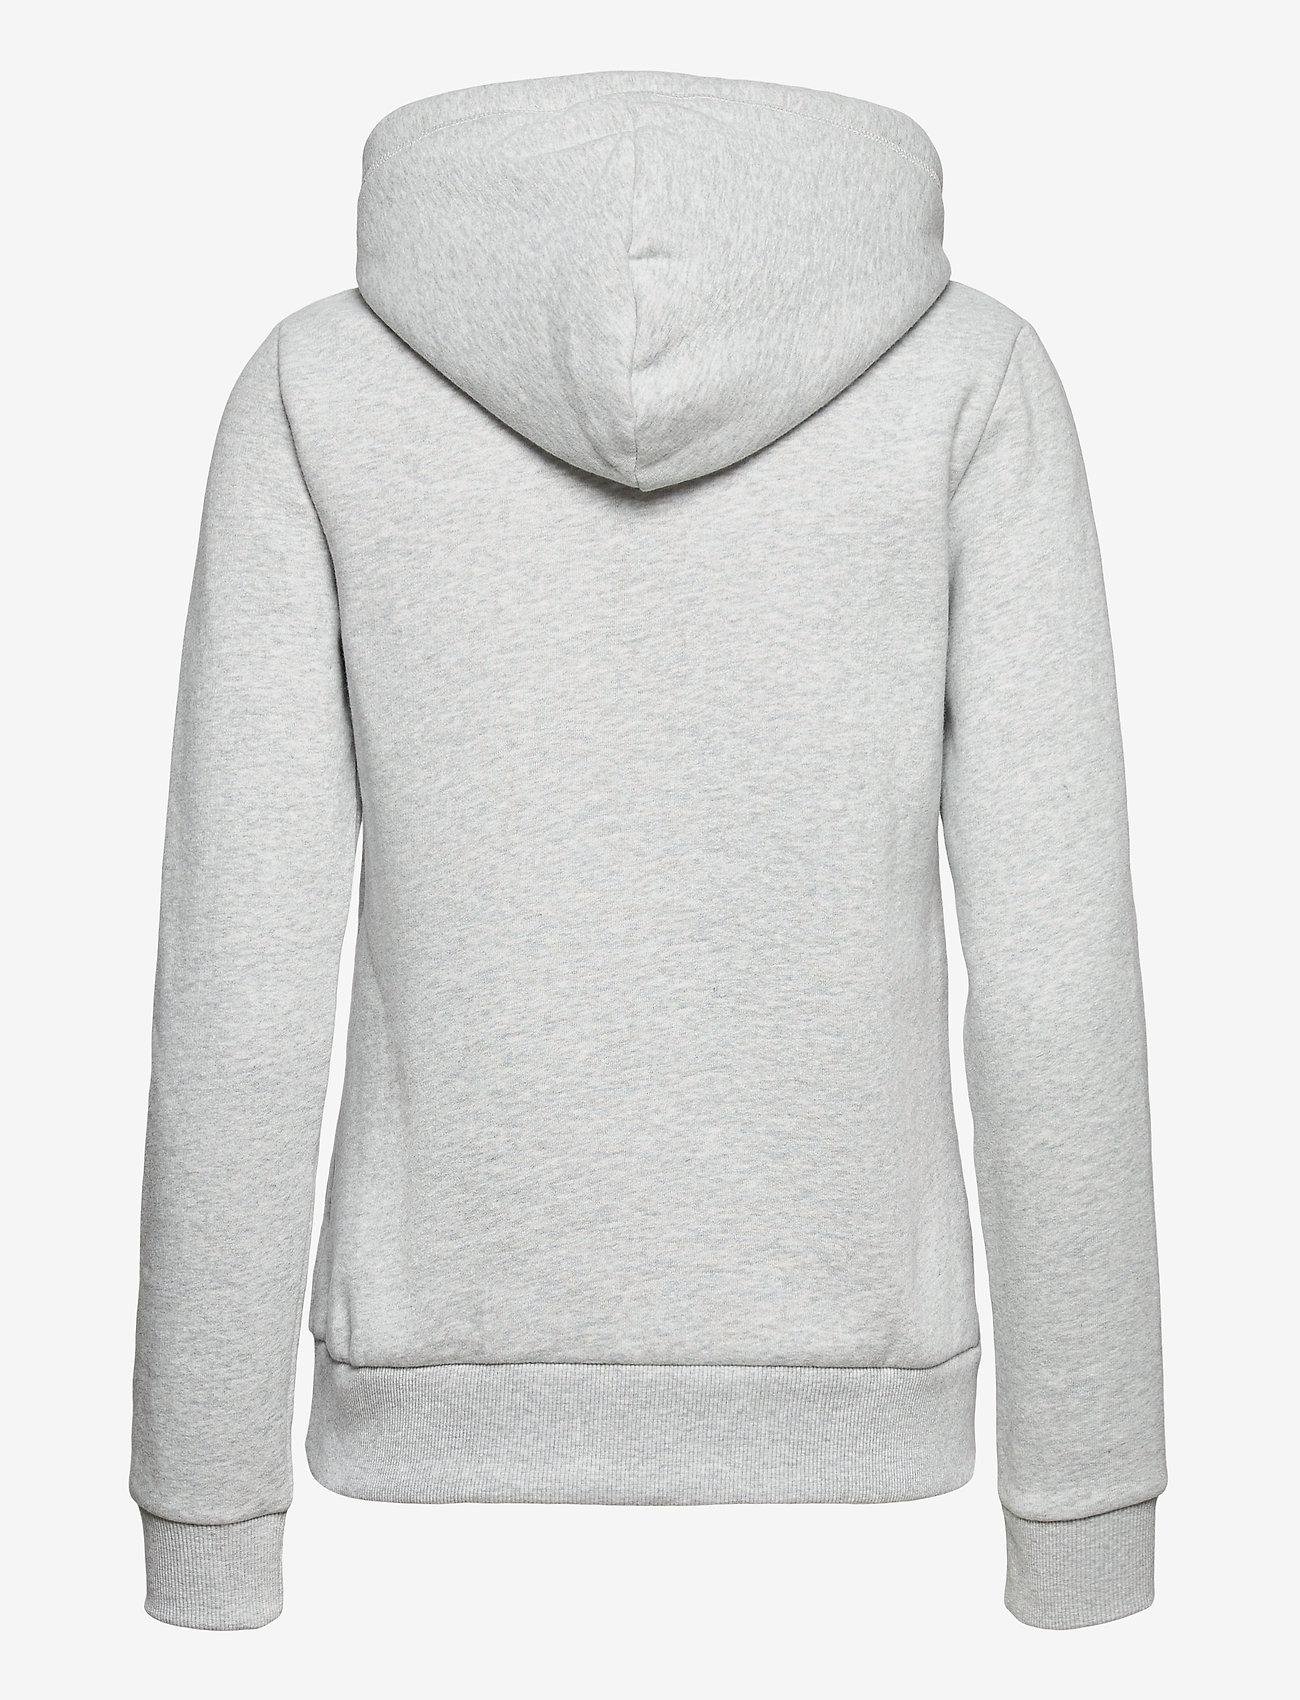 Superdry - OL CLASSIC HOOD BB - hoodies - light grey marl - 1